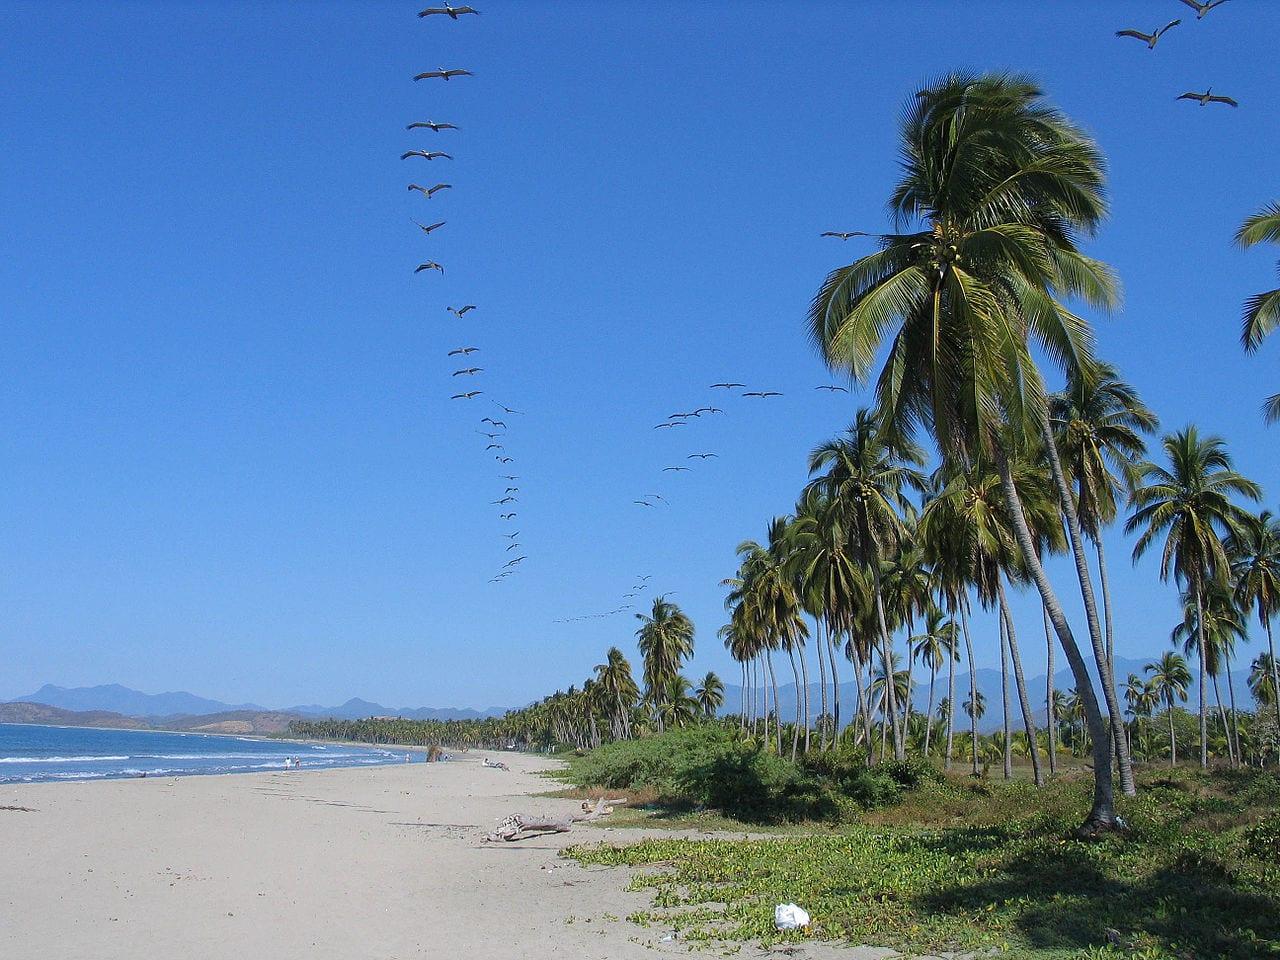 Playa Linda, Ixtapa